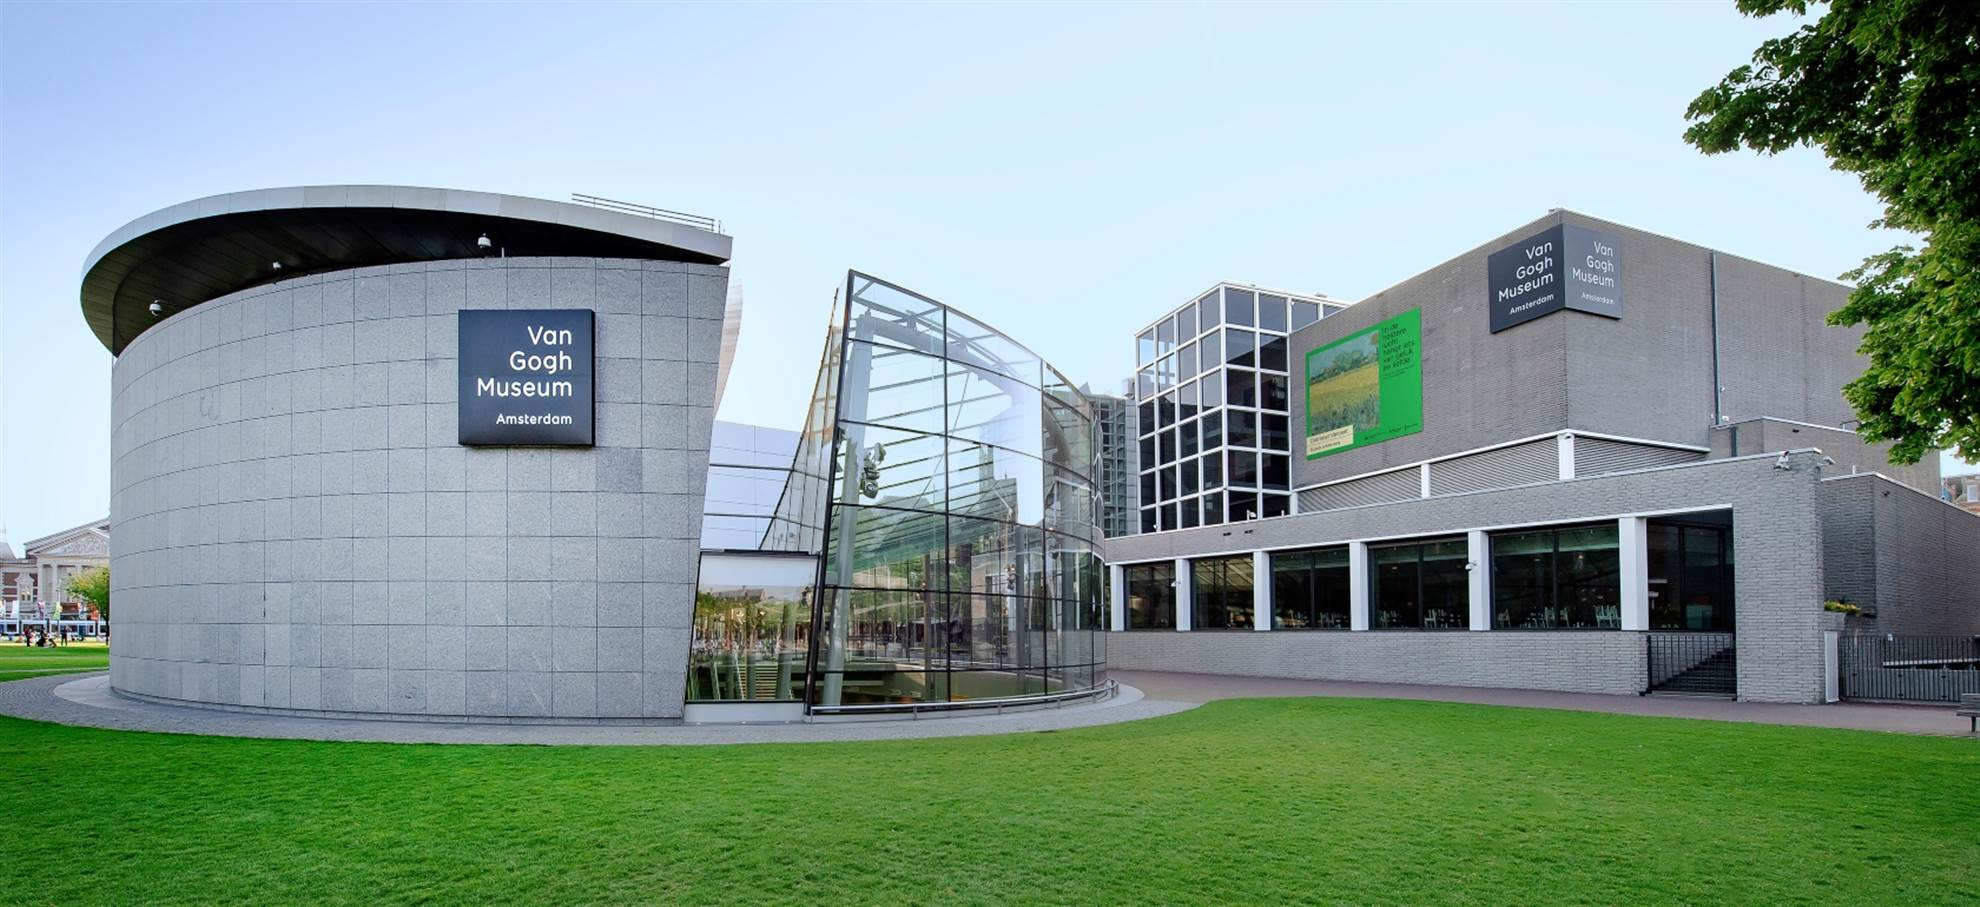 Grachtenfahrt & Van Gogh Museum